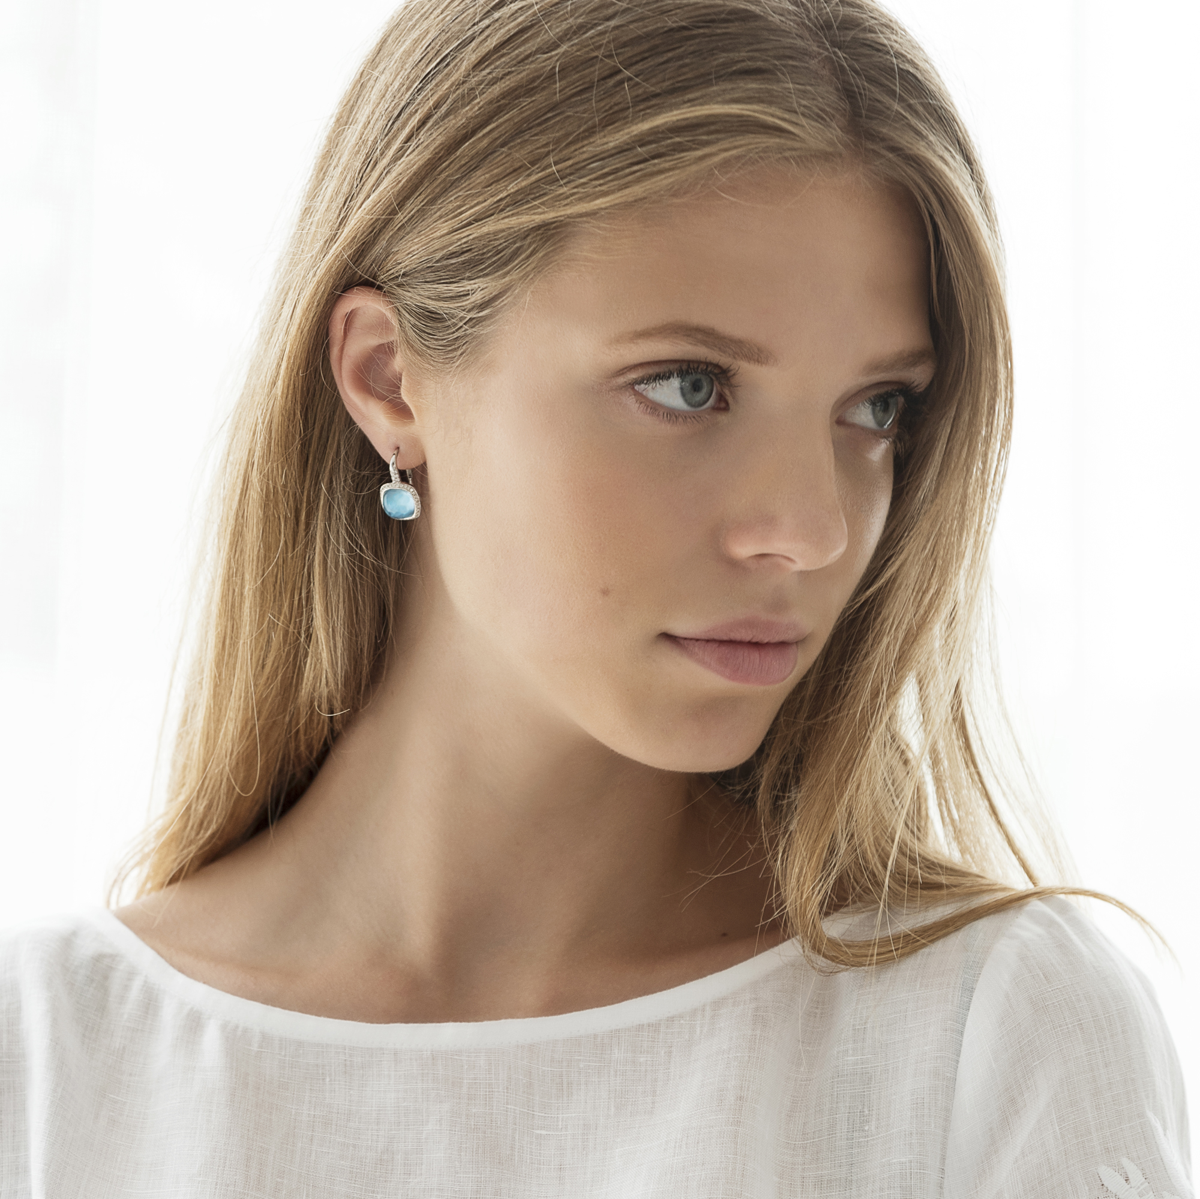 amiata earrings in white gold